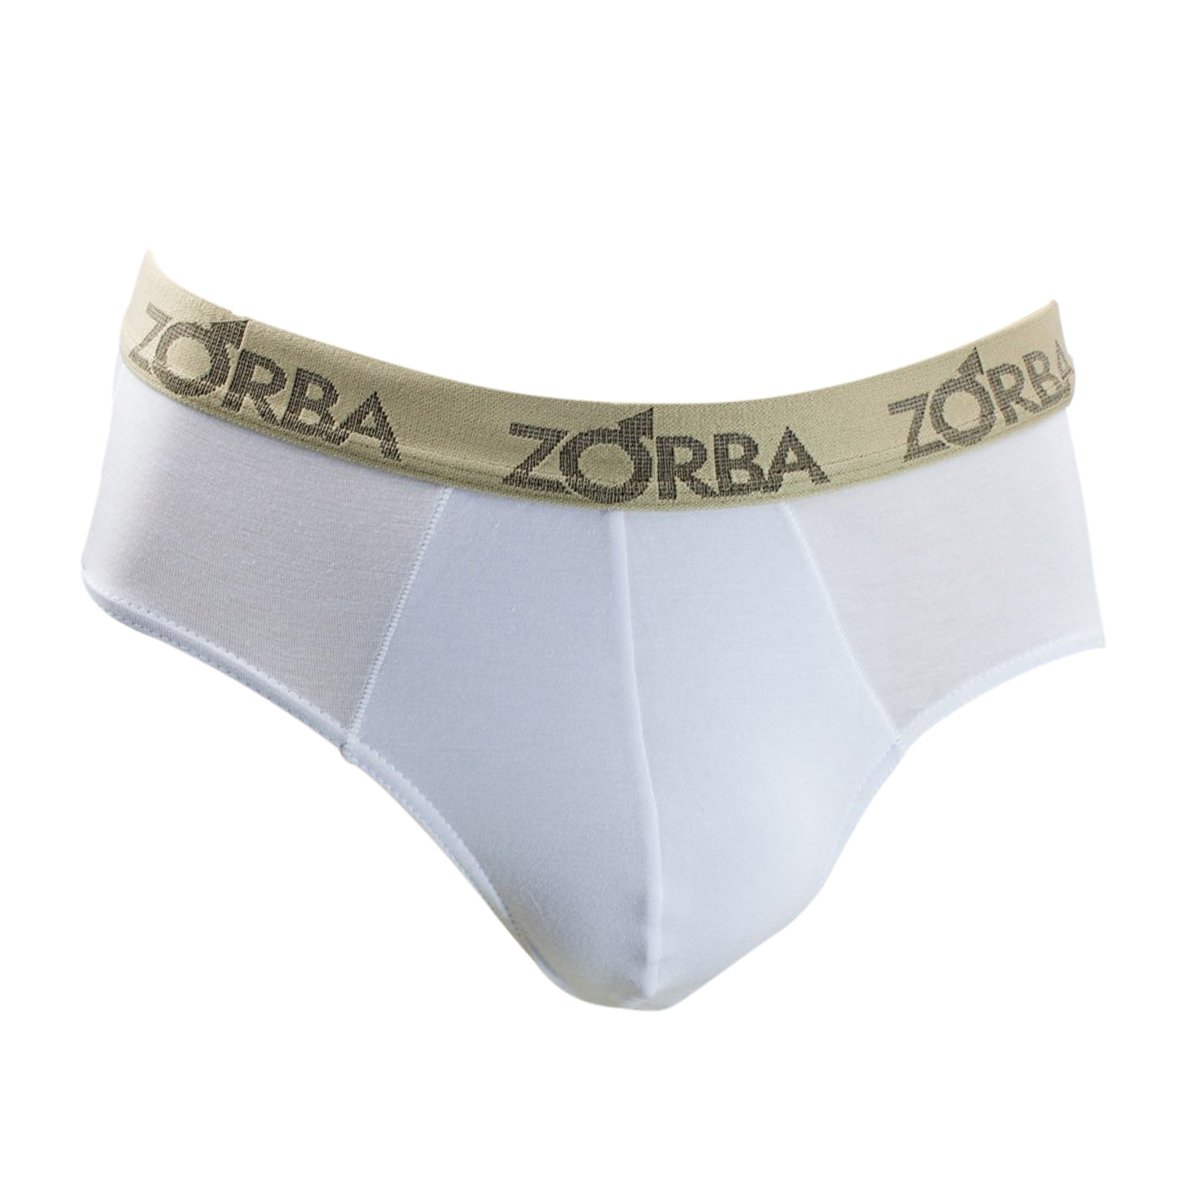 7c564568b Bizz Store - Cueca Masculina Zorba Slip Bambu Preta Branca